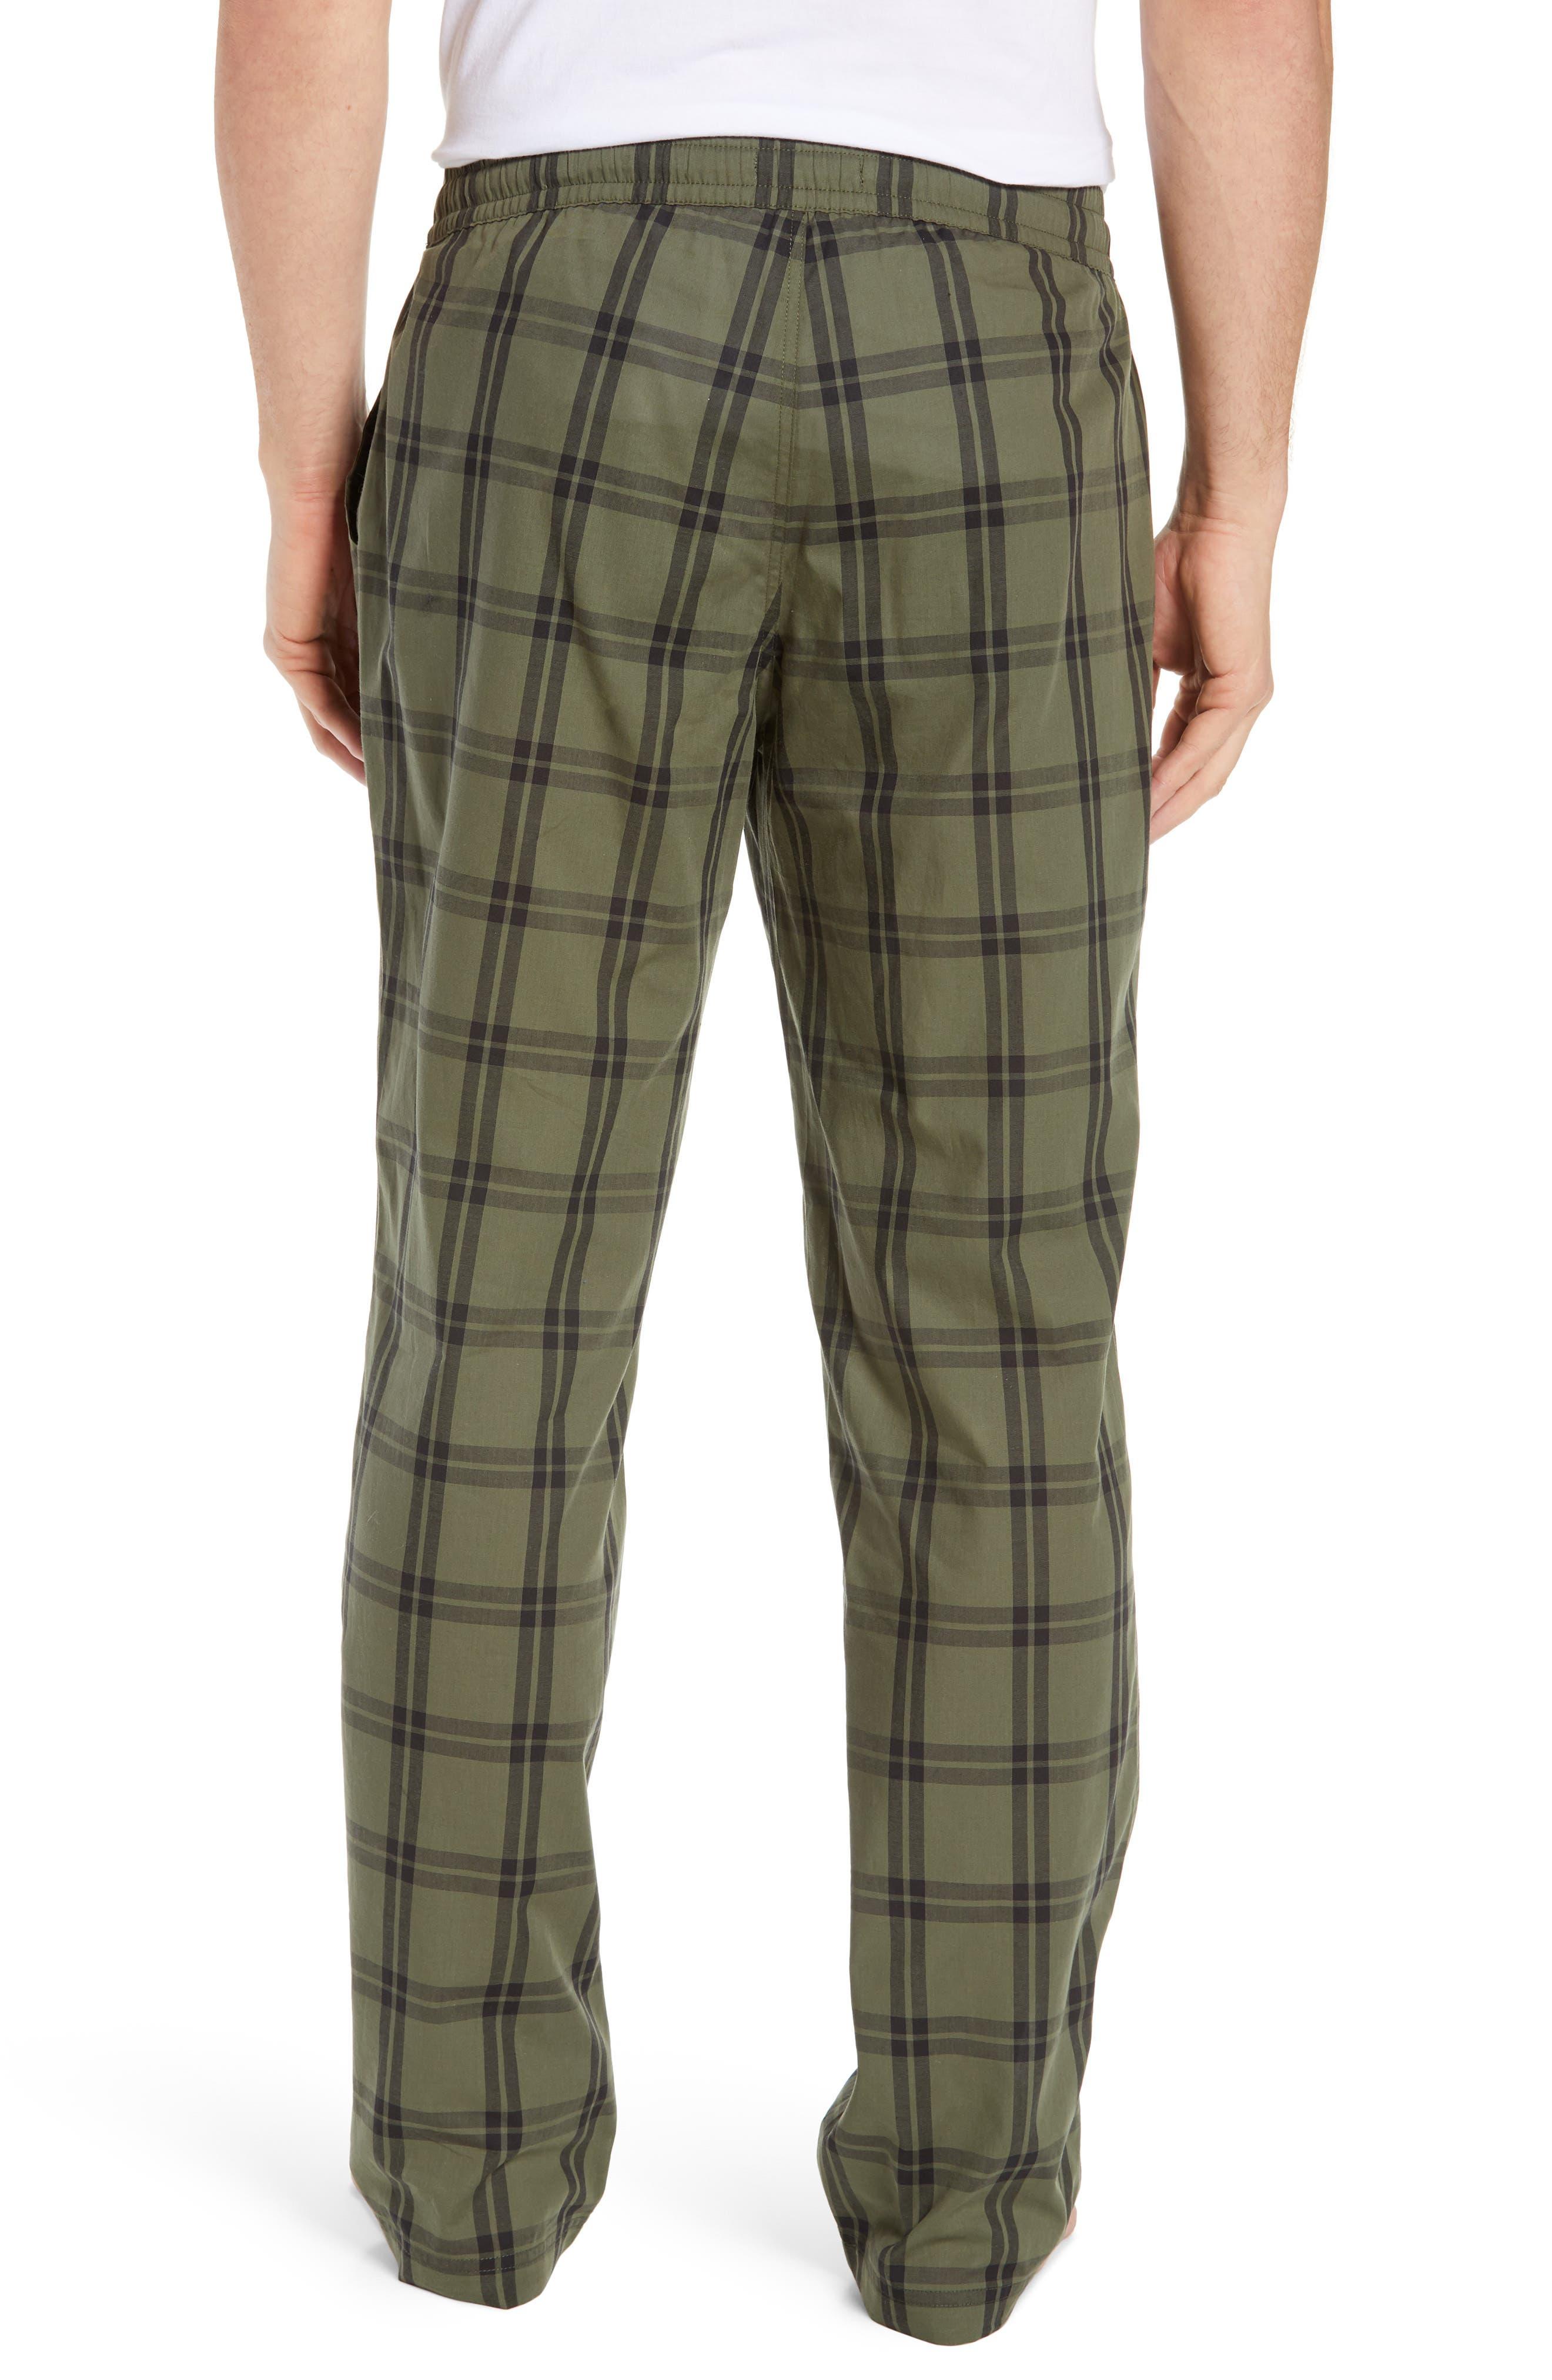 UGG<SUP>®</SUP>, Flynn Pajama Pants, Alternate thumbnail 2, color, CACTUS